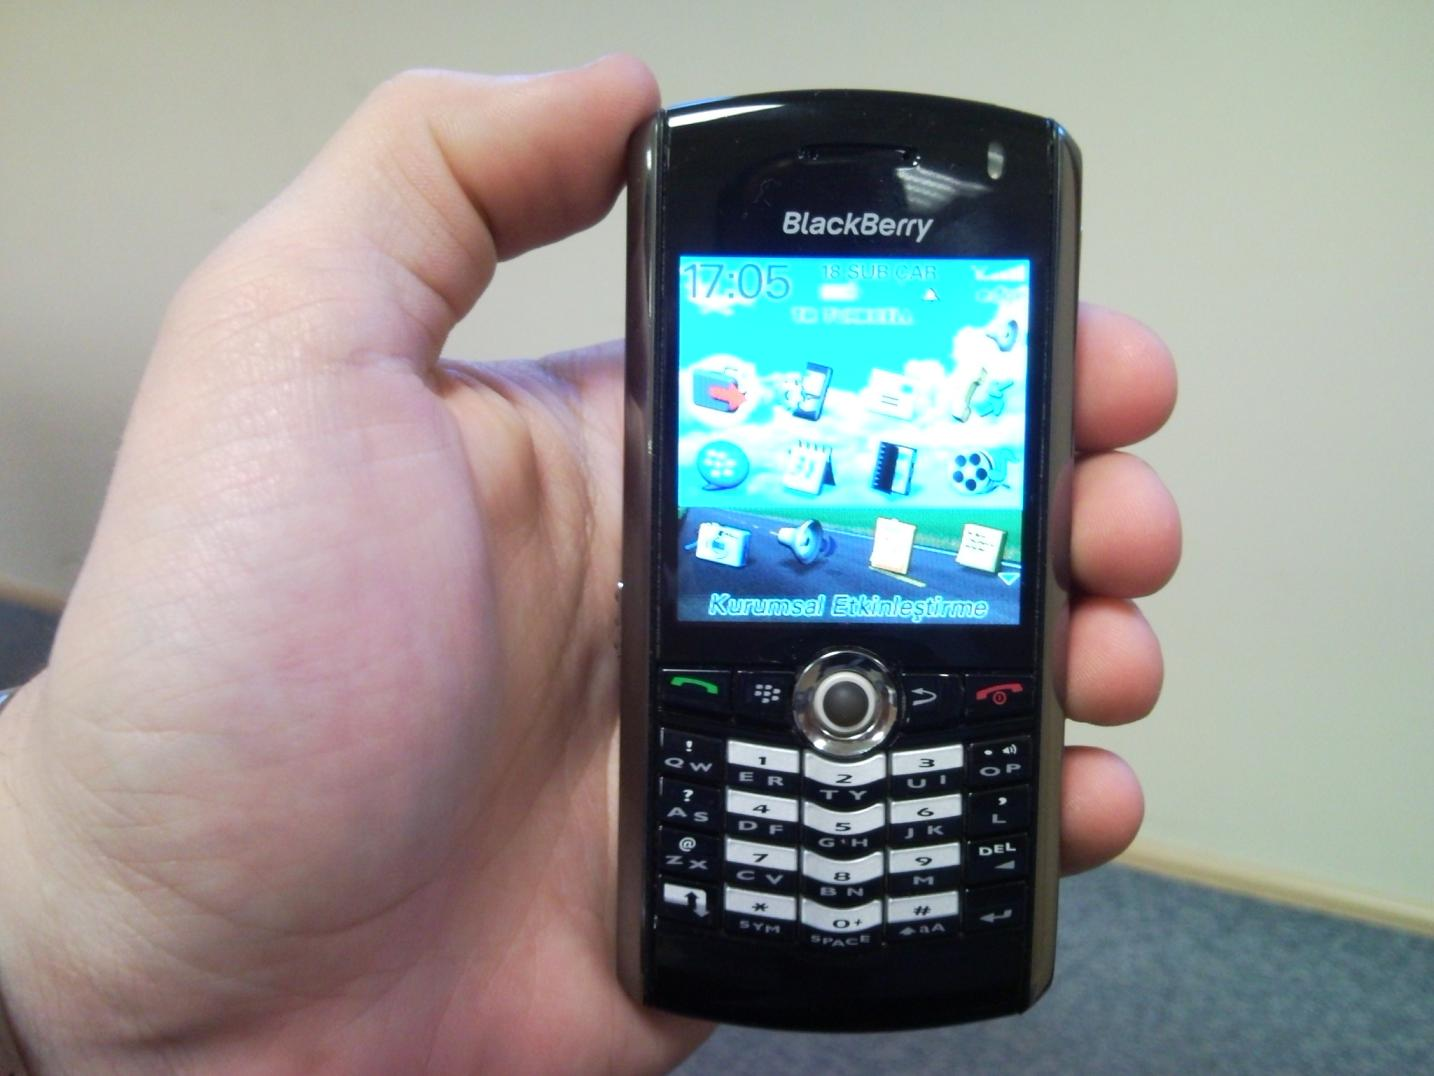 blackberry-pearl-flashing-green-indoor